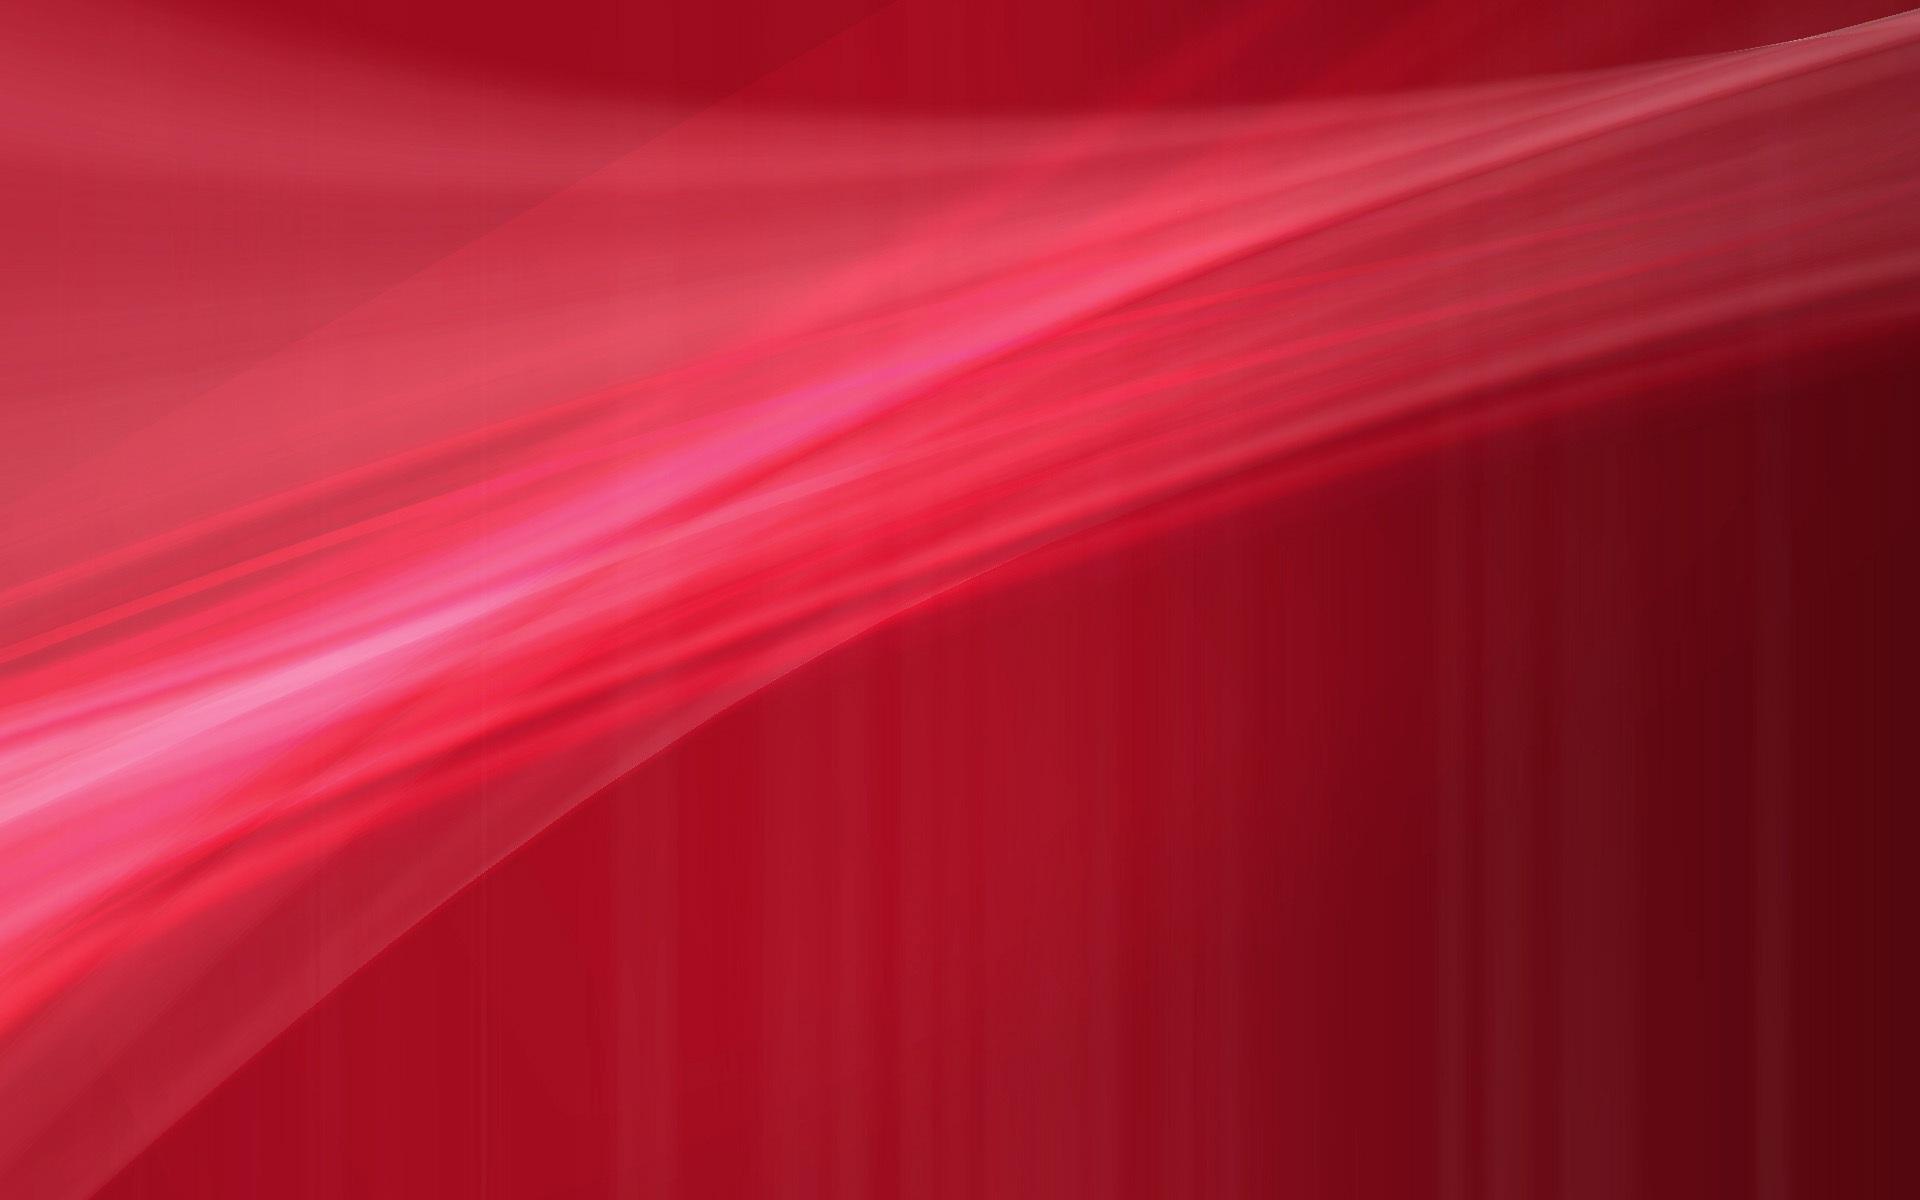 Red Abstract In Hd Desktop 162170 Wallpaper wallpaper